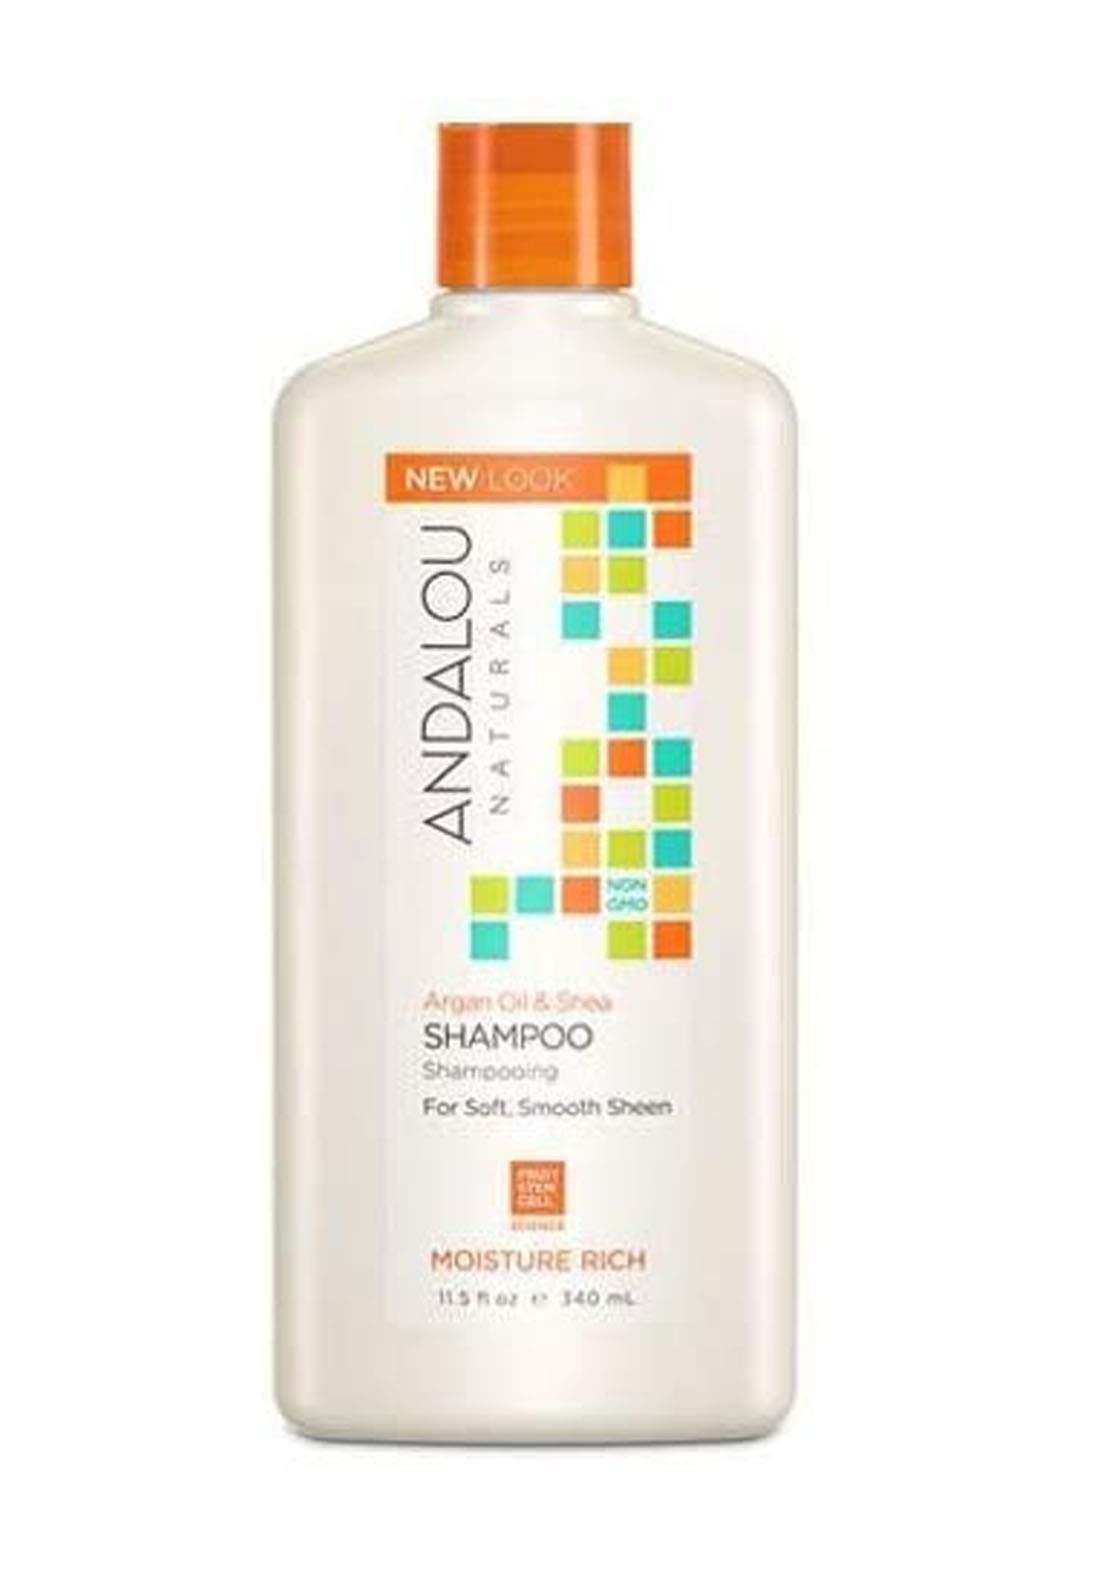 27102 Andalou Naturals Argan Oil AndShea Moisture Rich Shampoo 340ml  شامبو للشعر